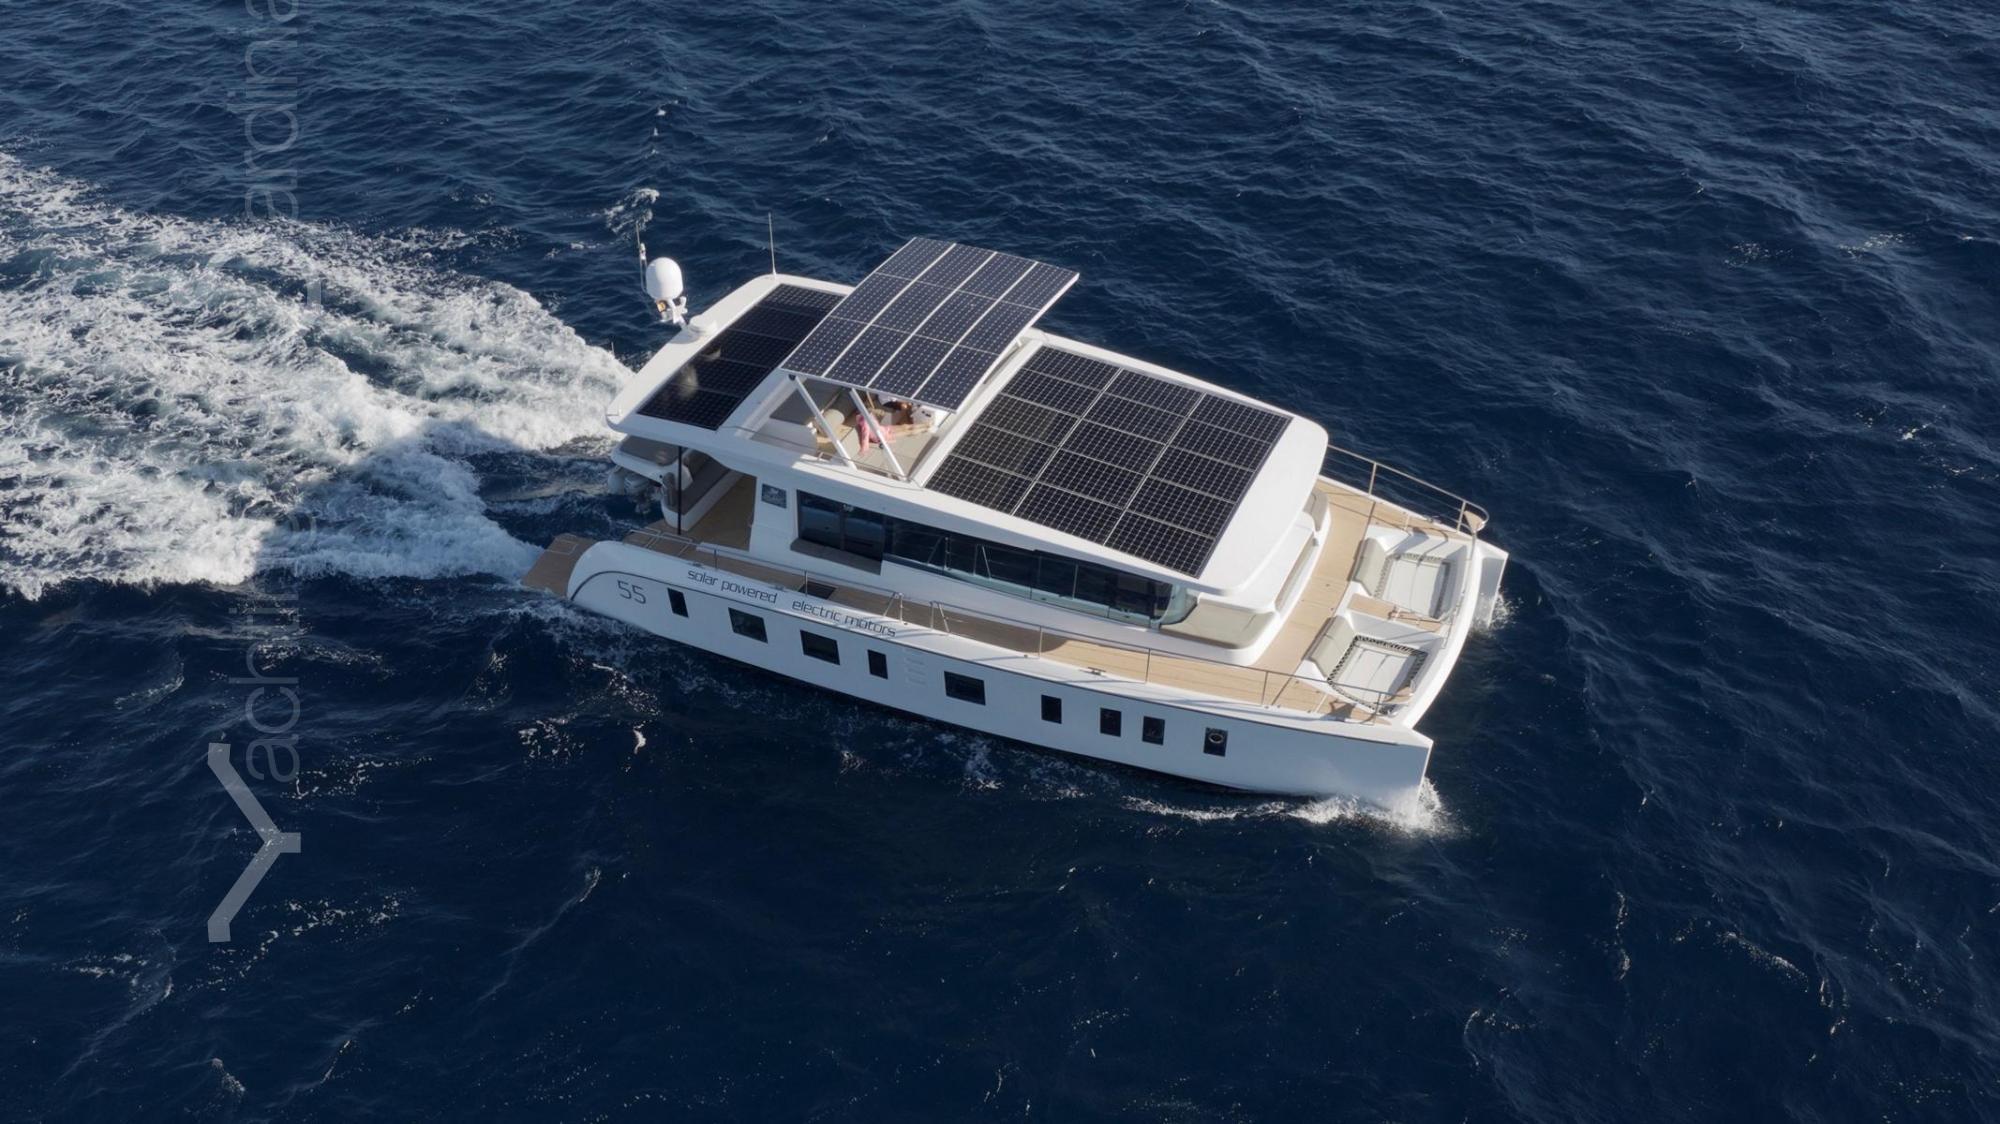 Silent Yacht Event in Palma di Majorca